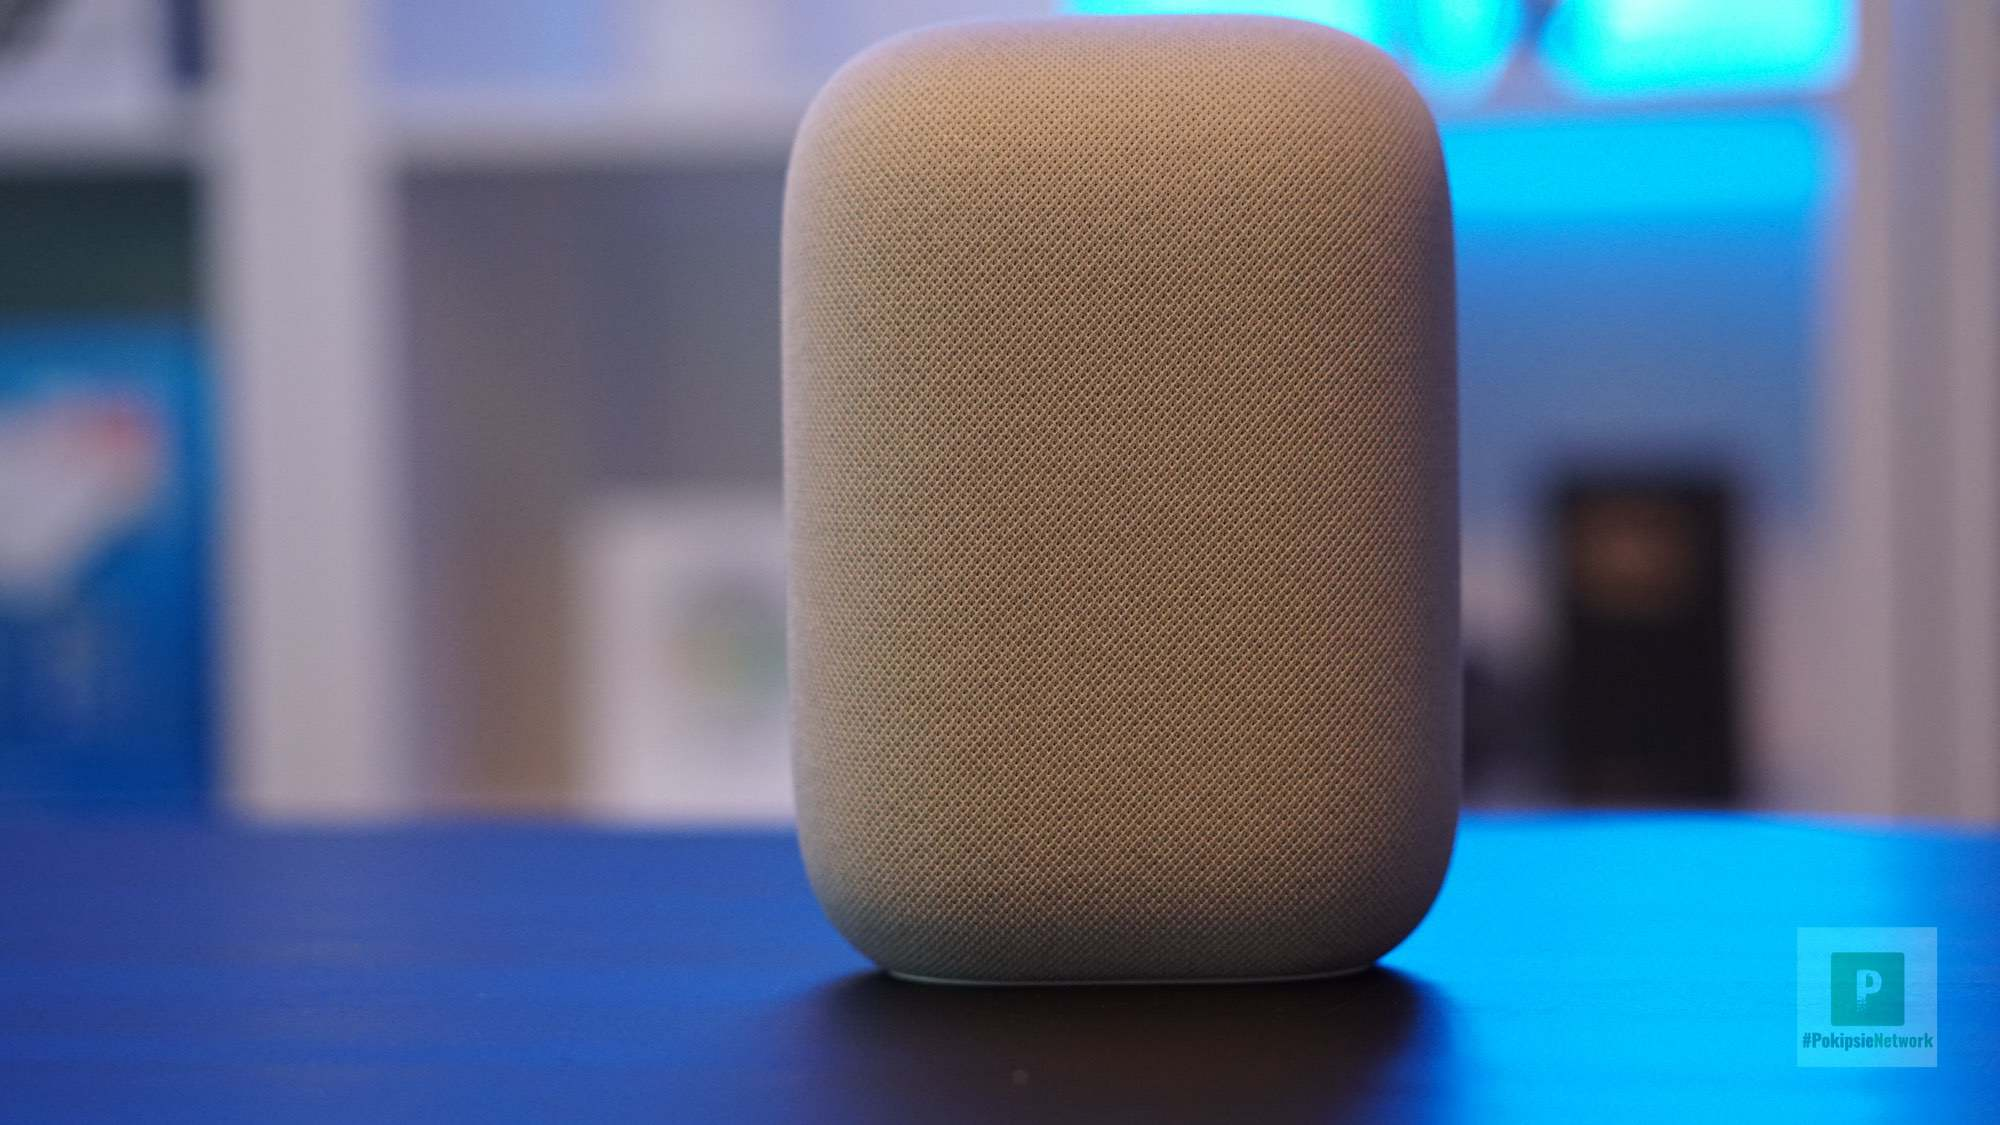 OK Google starte Podcasts – Mit dem Google Assistant Podcasts starten